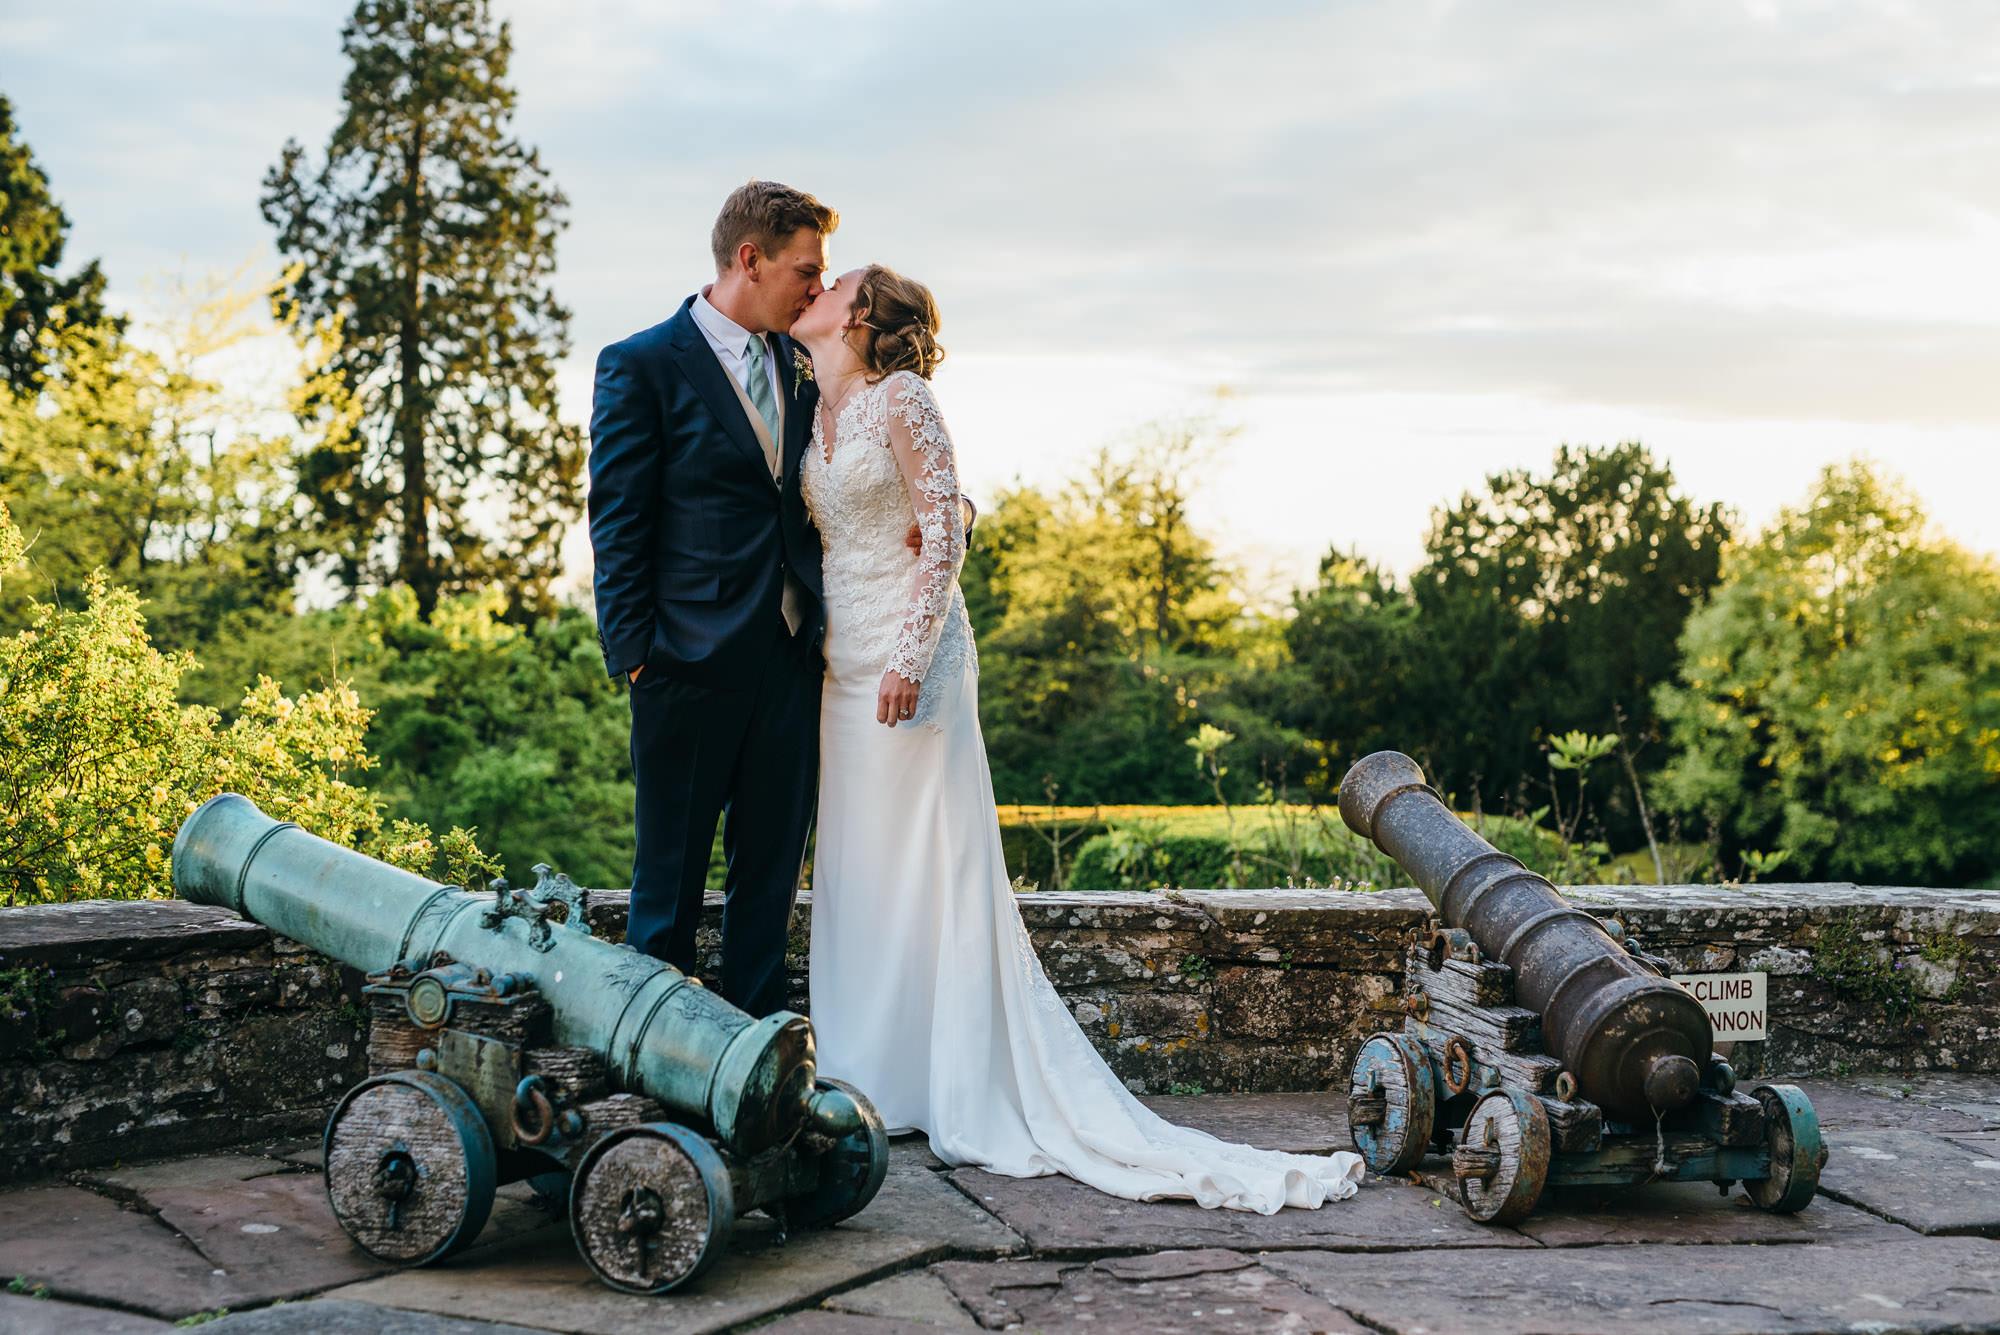 Berkeley castle wedding captured by simon biffen photography 1